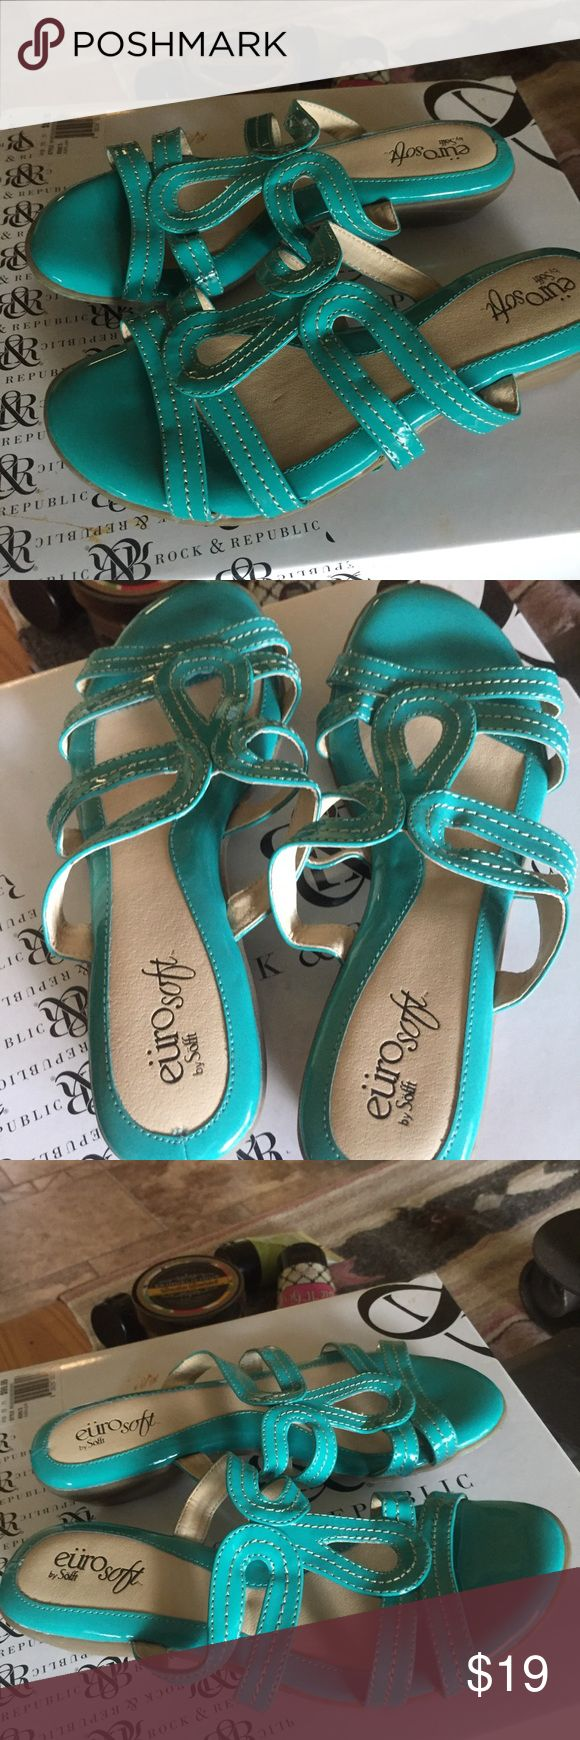 Eürosoft by Söfft Dark Teal Sandals, NWOT Eürosoft by Söfft Teal Sandals Size: 6.                                                         NWOT.                                                         Leather Upper and Lining Eürosoft by Söfft Shoes Sandals